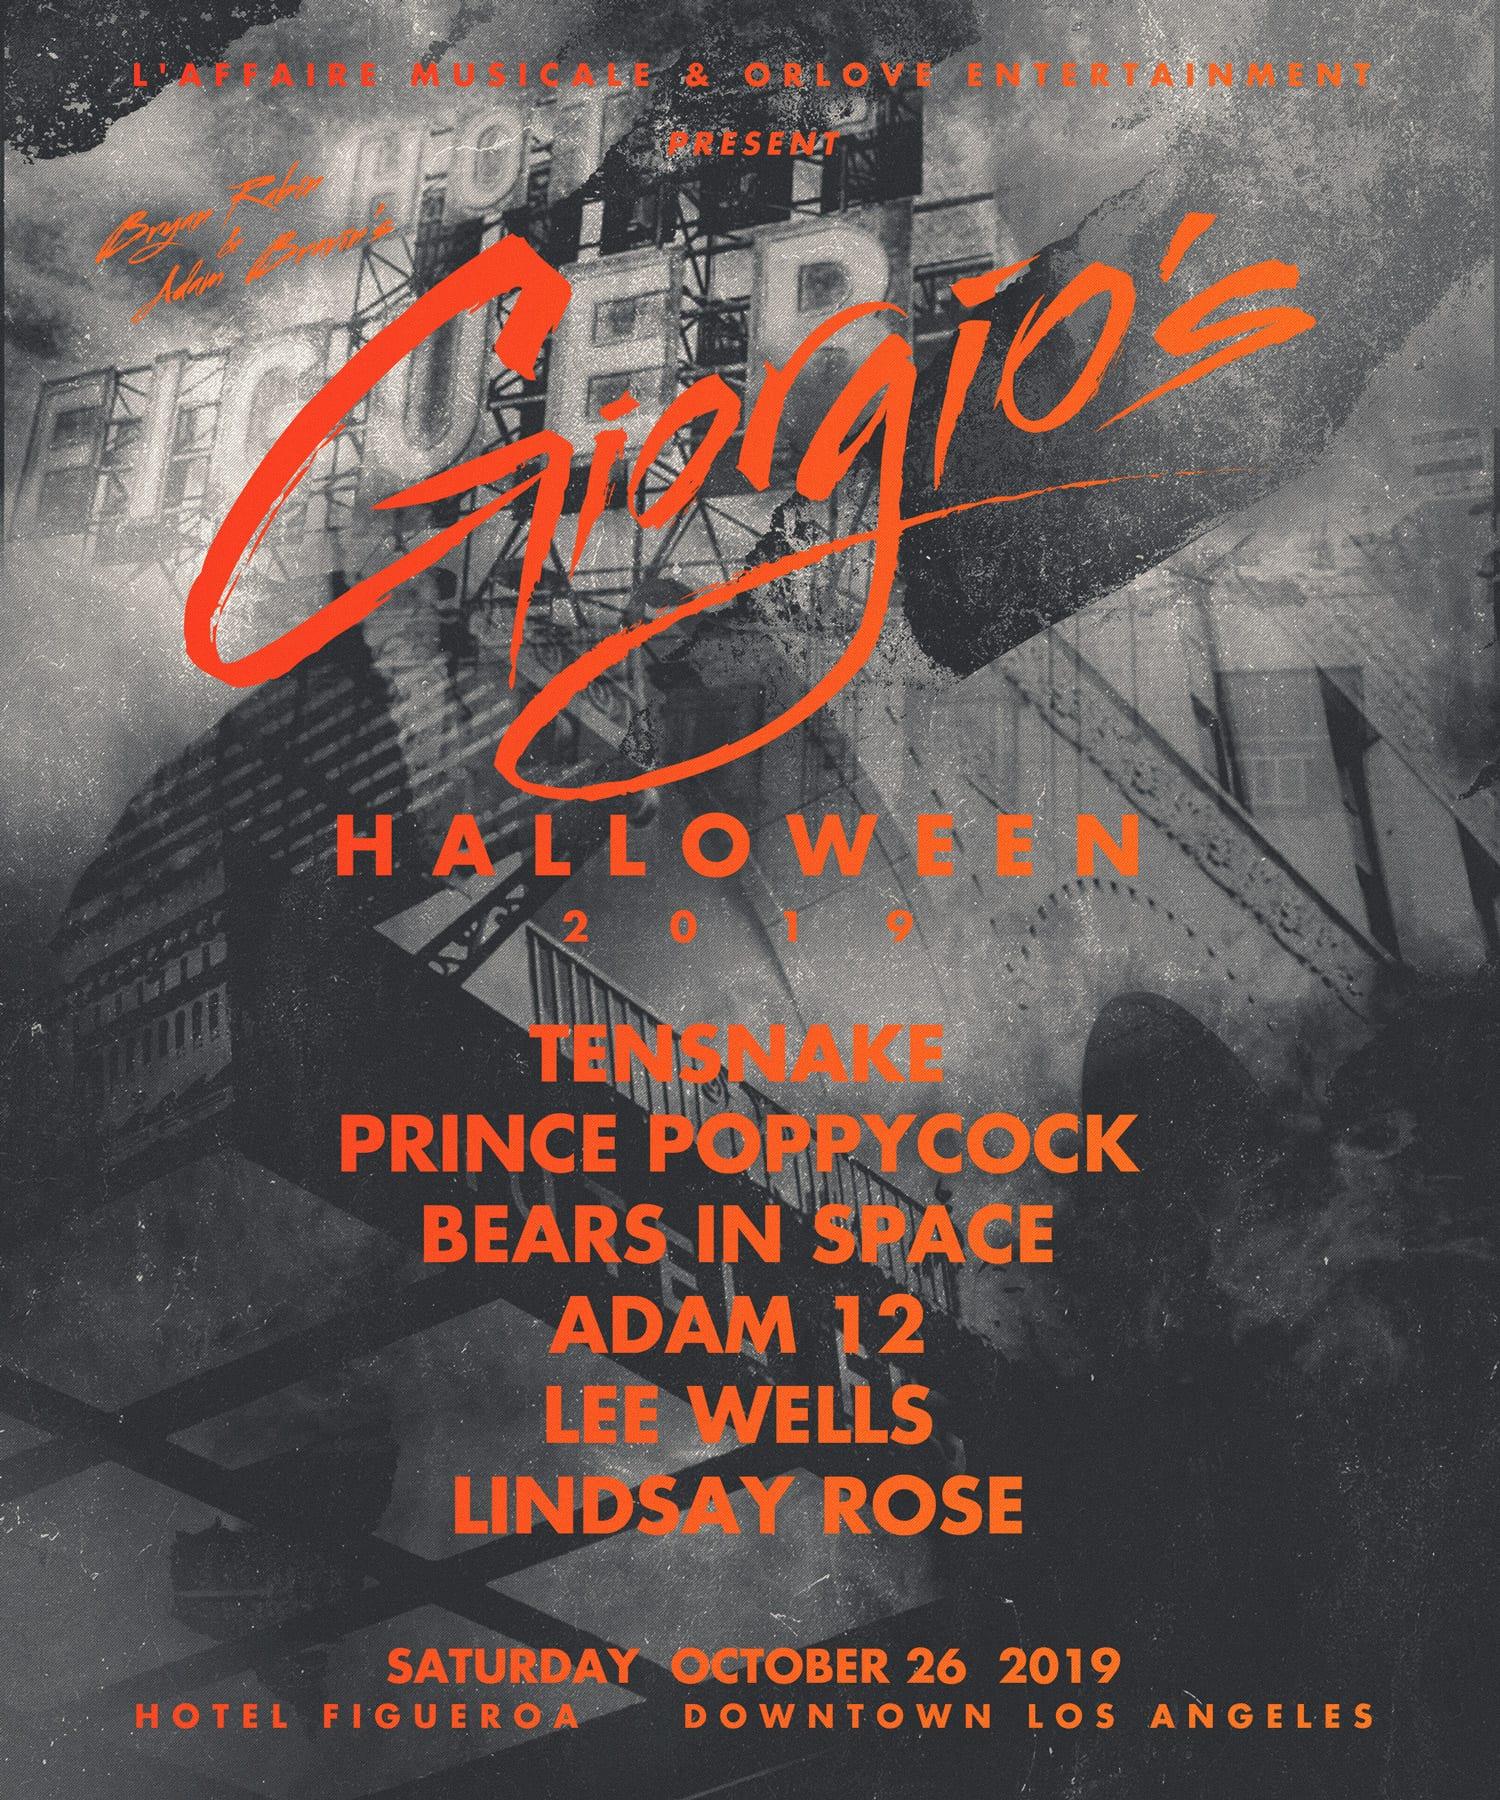 Giorgio's Halloween 2019